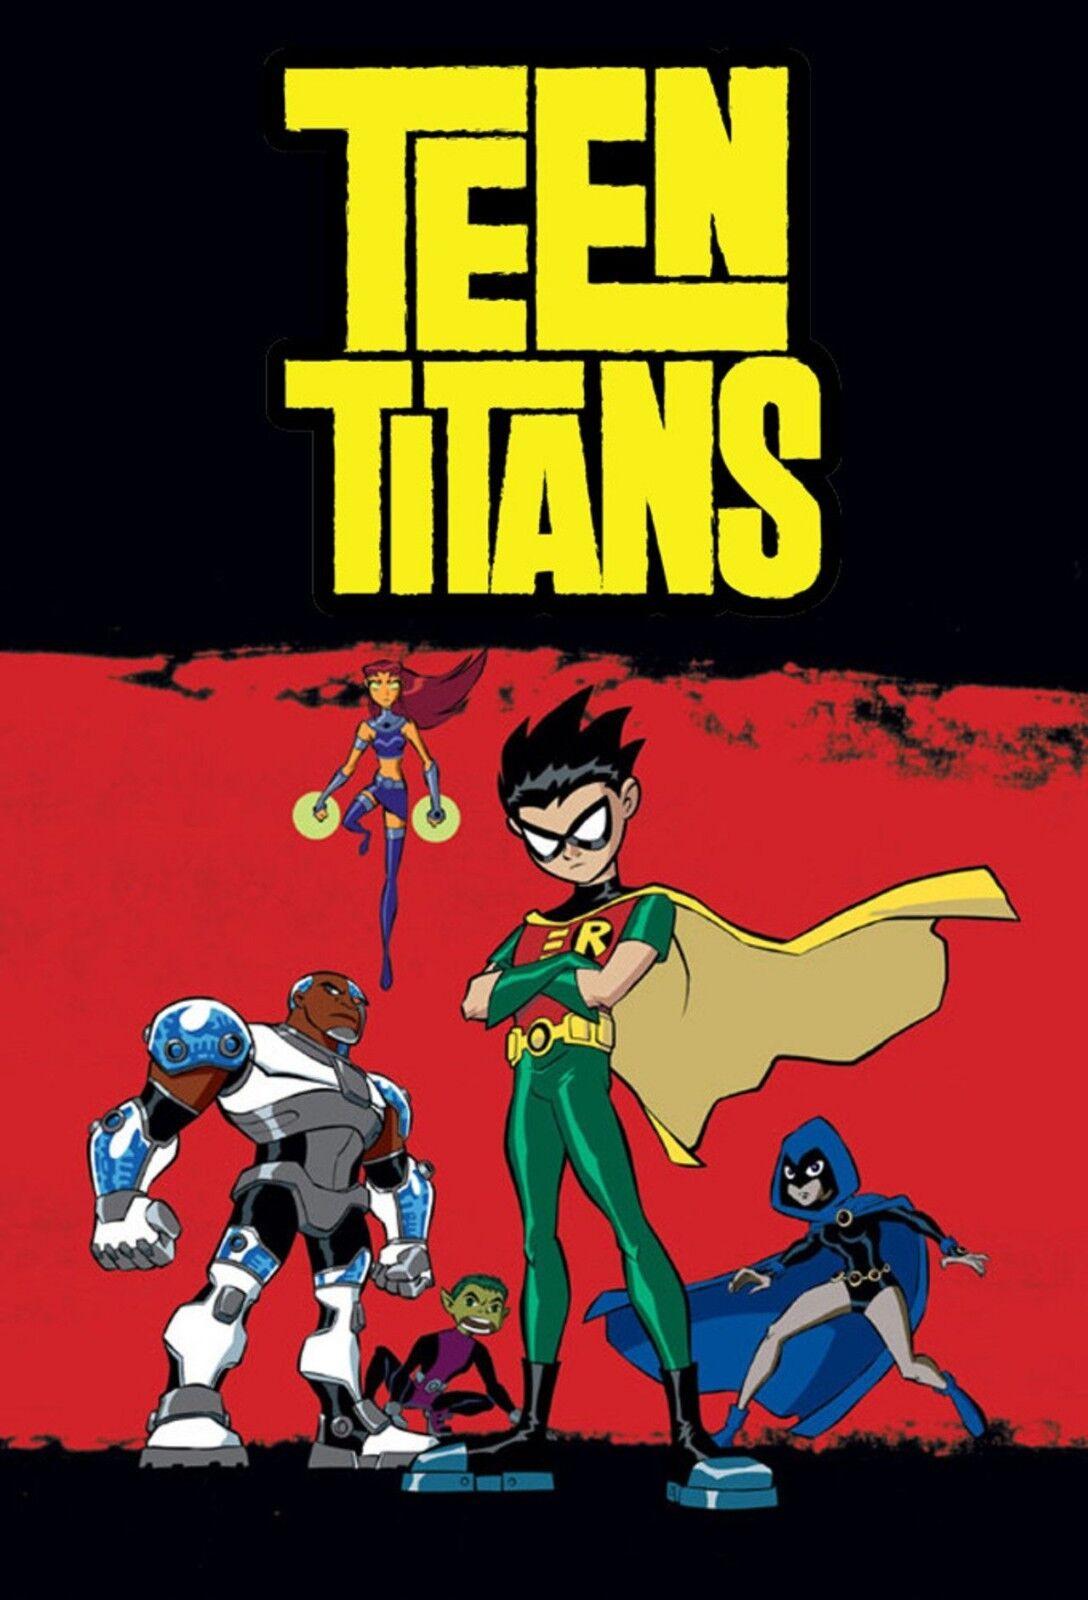 Teen Titans Complete Series Seasons 1 2 3 4 5 - DVD - ENGLISH